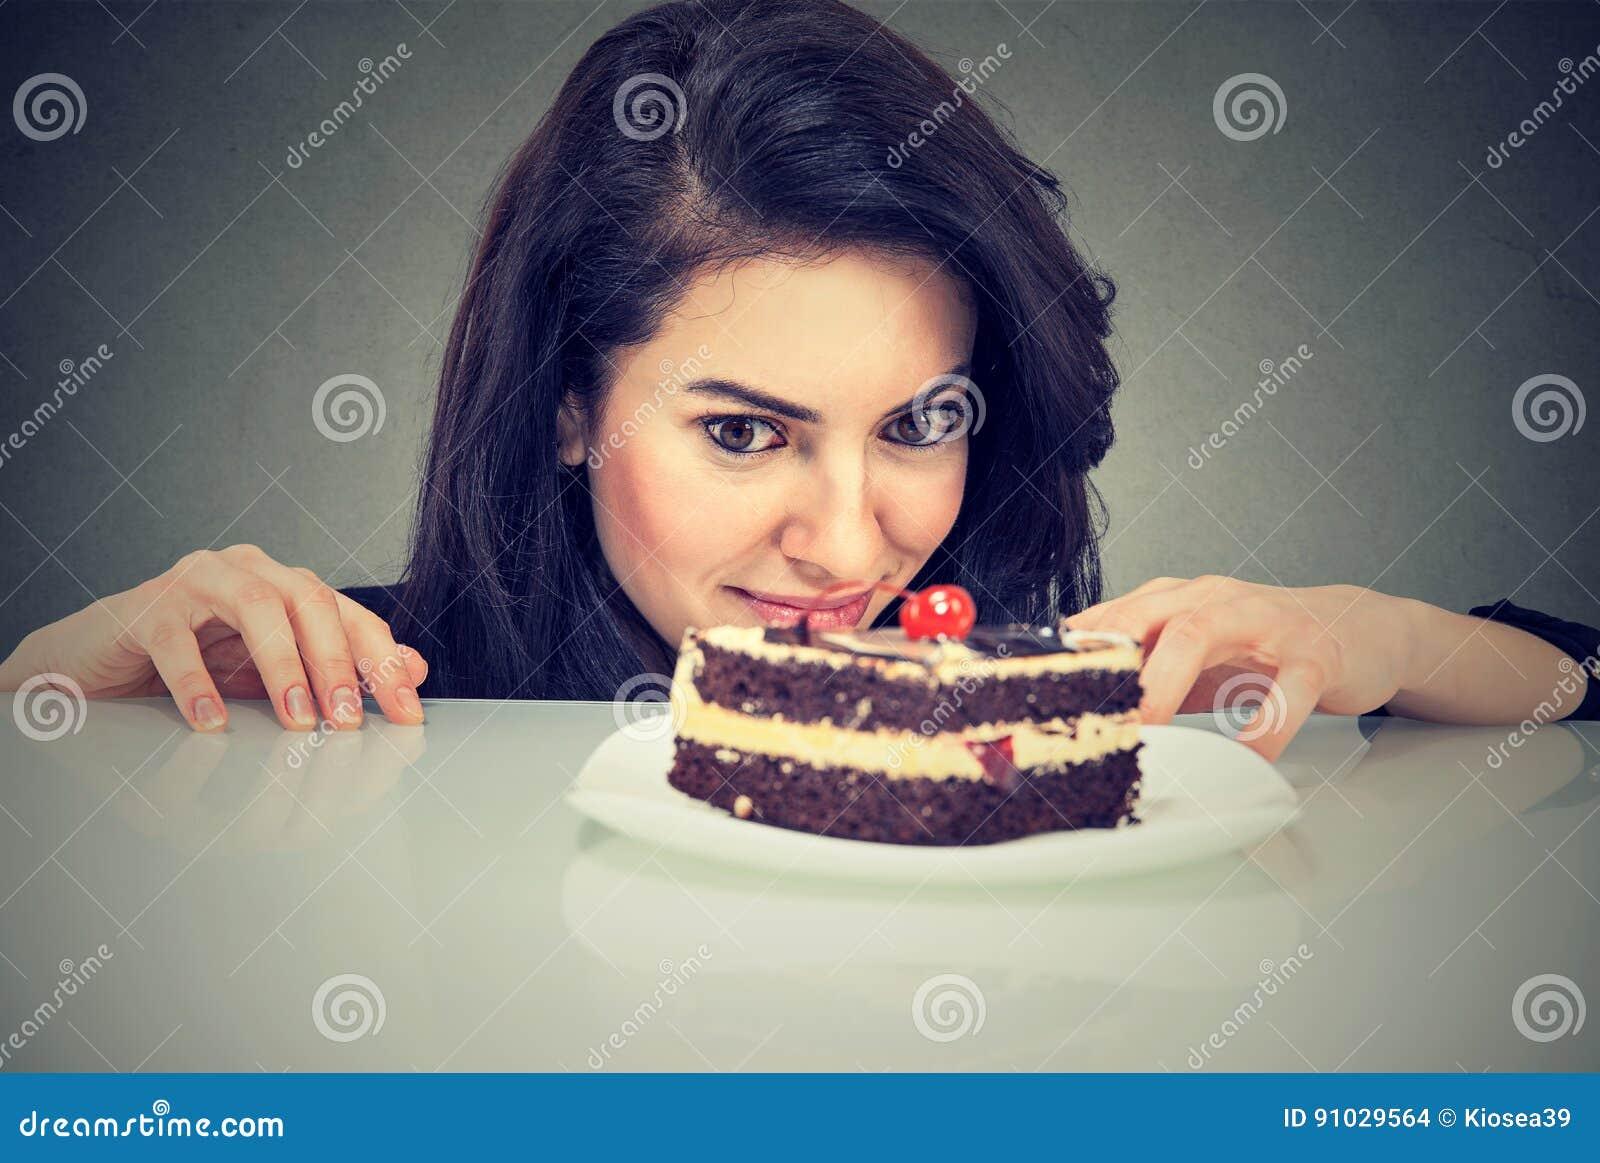 Woman craving cake dessert, eager to eat sweet food